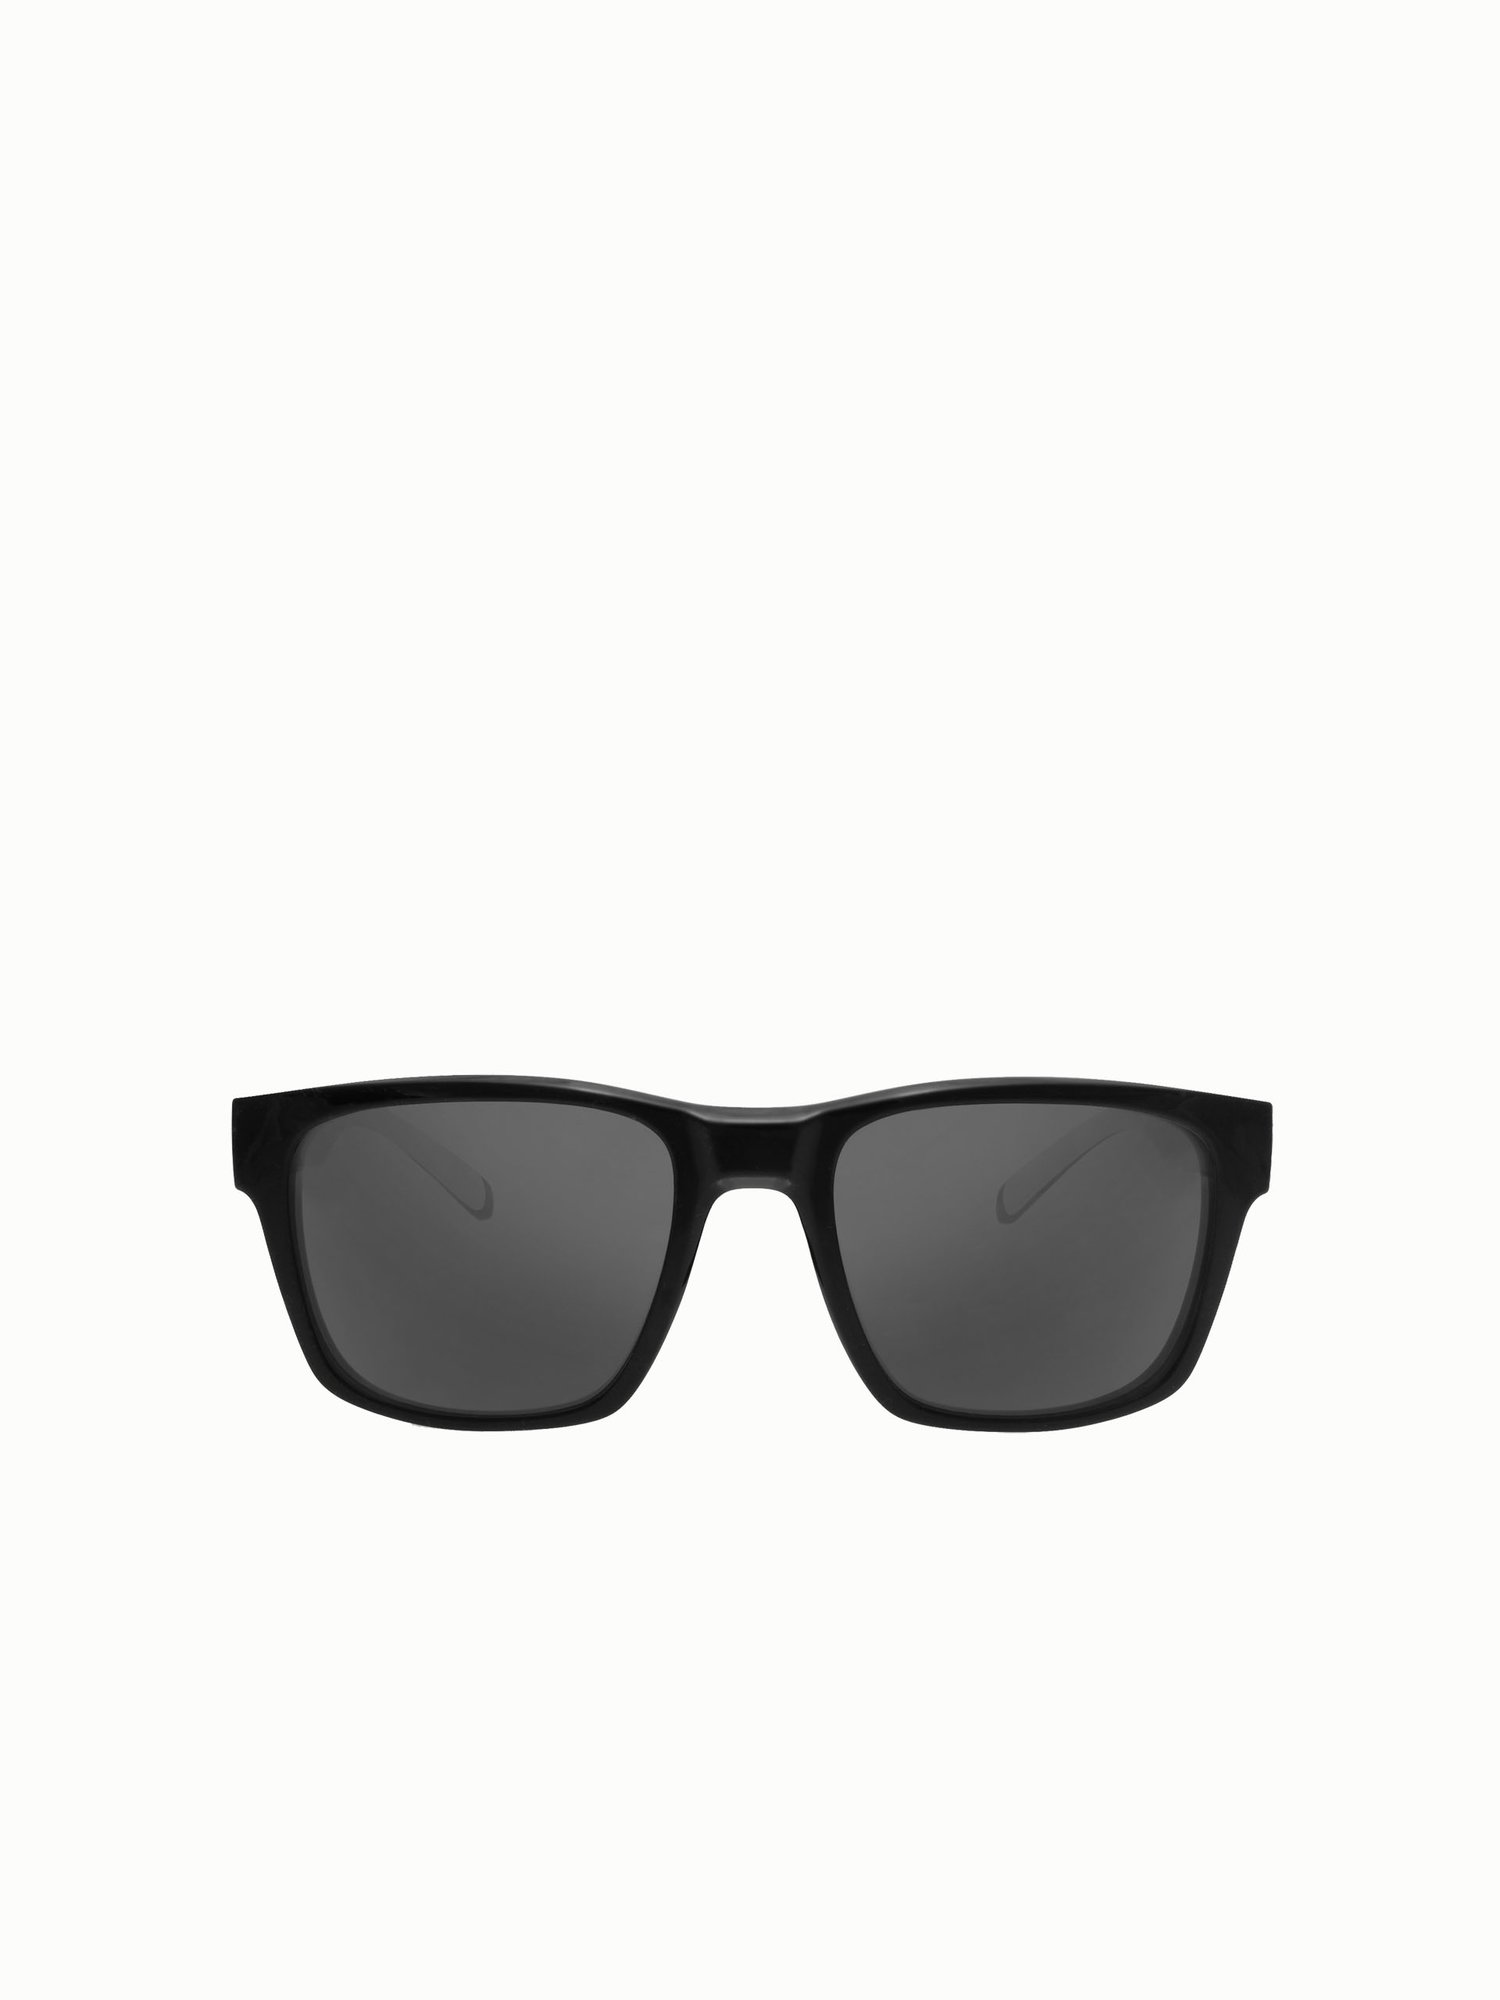 Sailing Sunglasses - Black / Light Grey / Smoke Grey